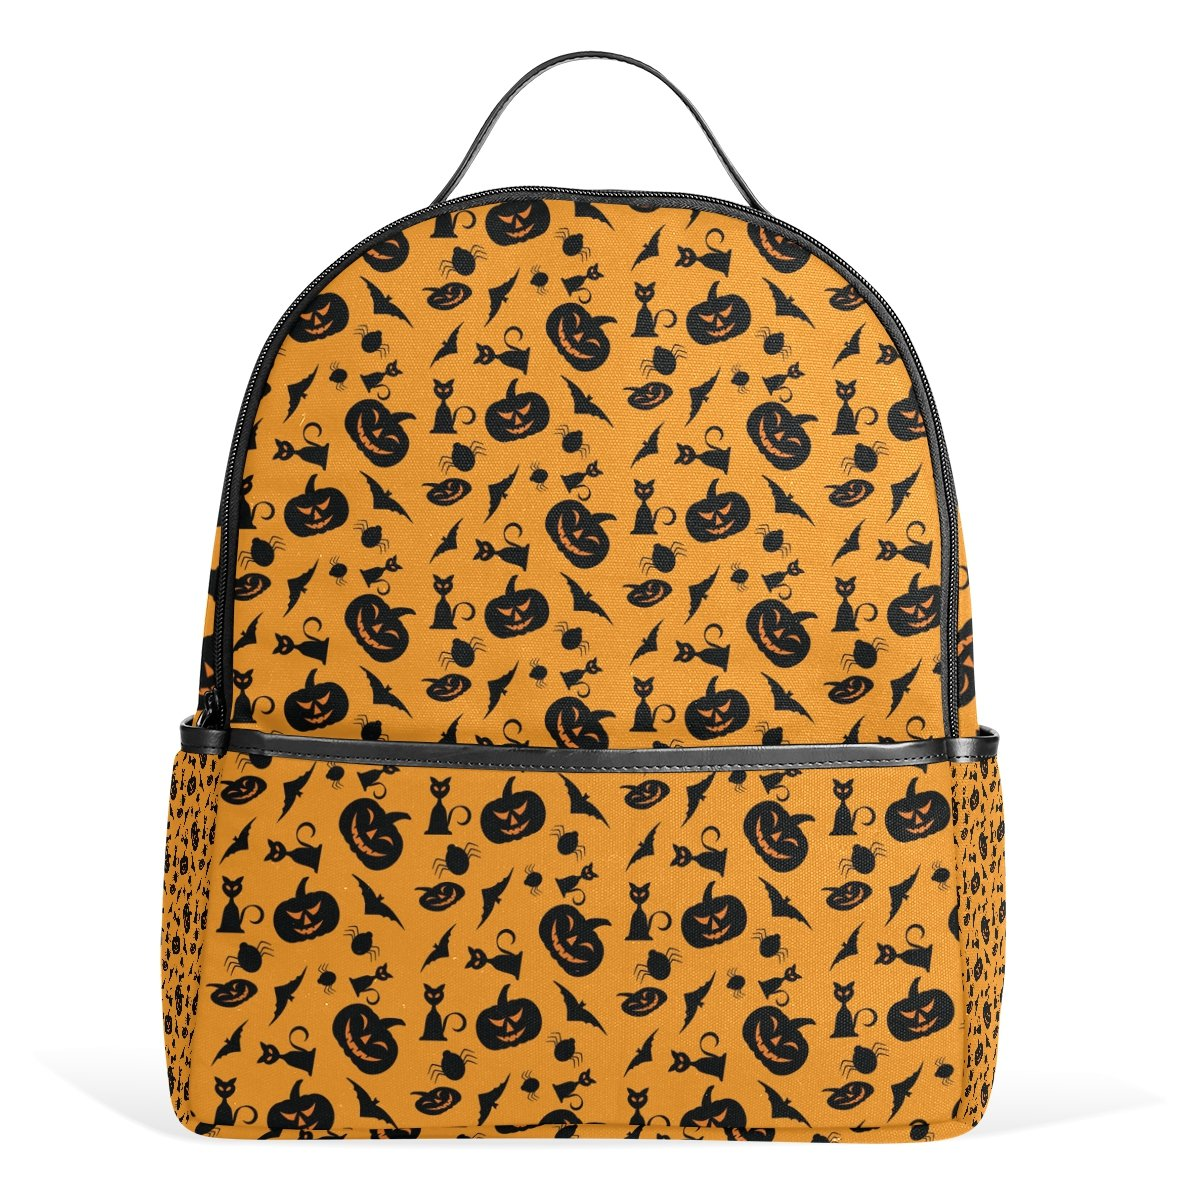 JSTEL Halloween School Backpack 4th 5th 6th Grade for Boys Teen Girls Kids   Amazon.co.uk  Clothing b489c544f8405